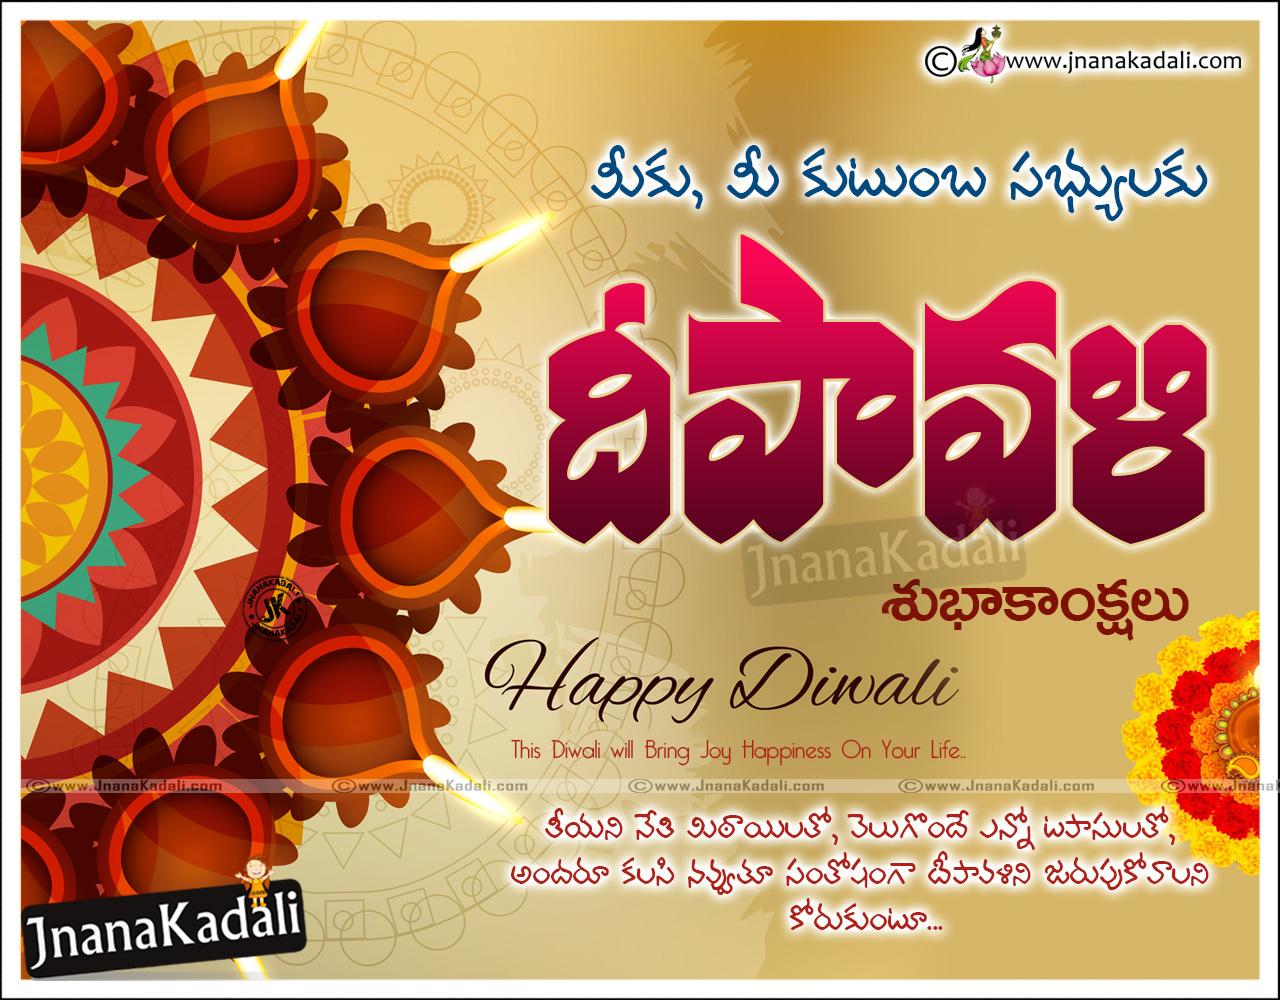 Telugu diwali greetings with hd wallpapers online telugu 2016 diwali latest online diwali greetings quotes hd wallpapers online diwali latest greetings for facebook whats app status diwali magical greetings diwali magical kristyandbryce Gallery